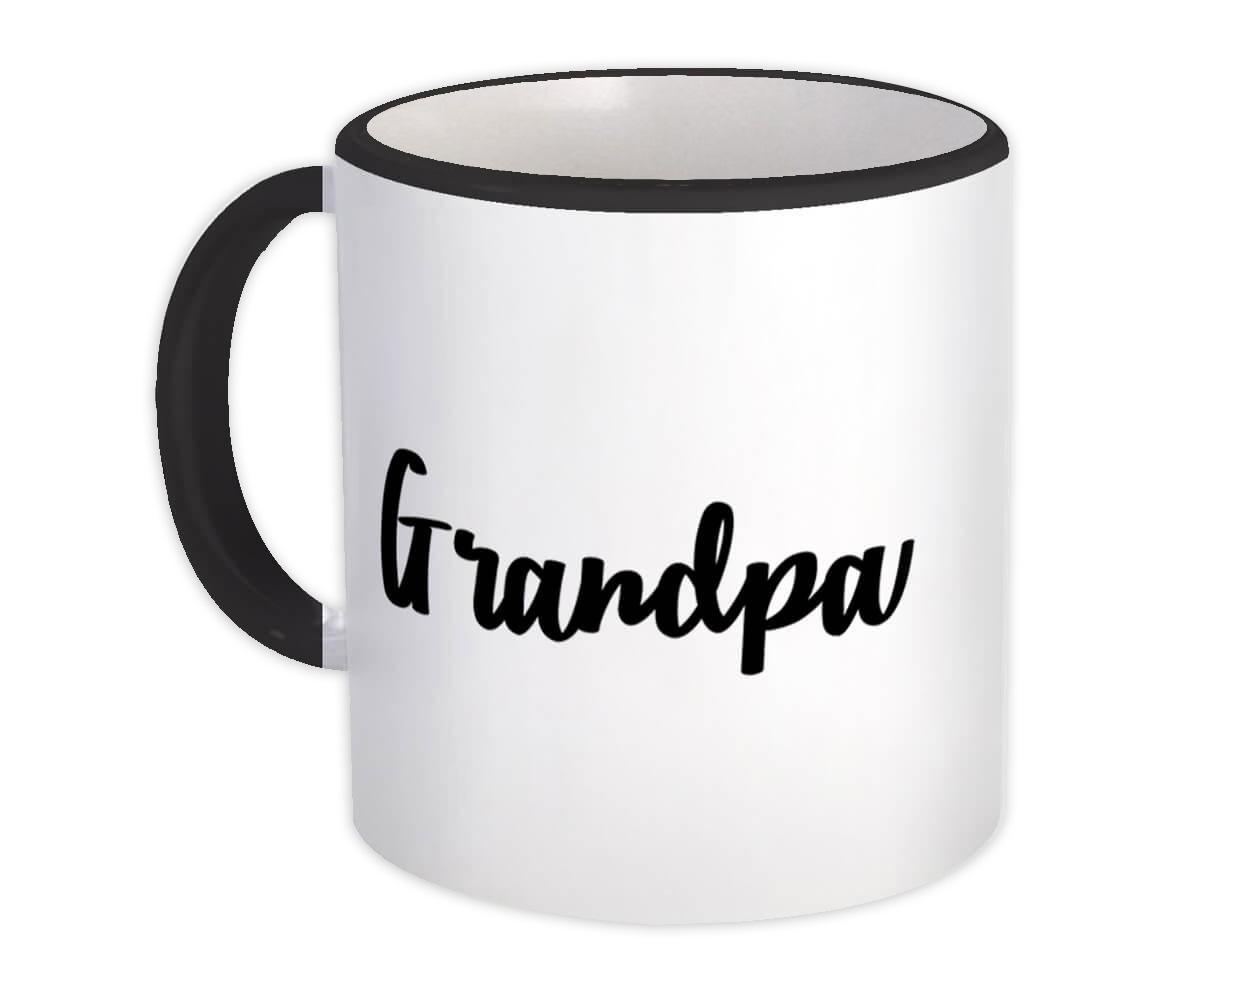 Grandpa : Gift Mug Quote Family Love Grandfather Grampy Fathers Day